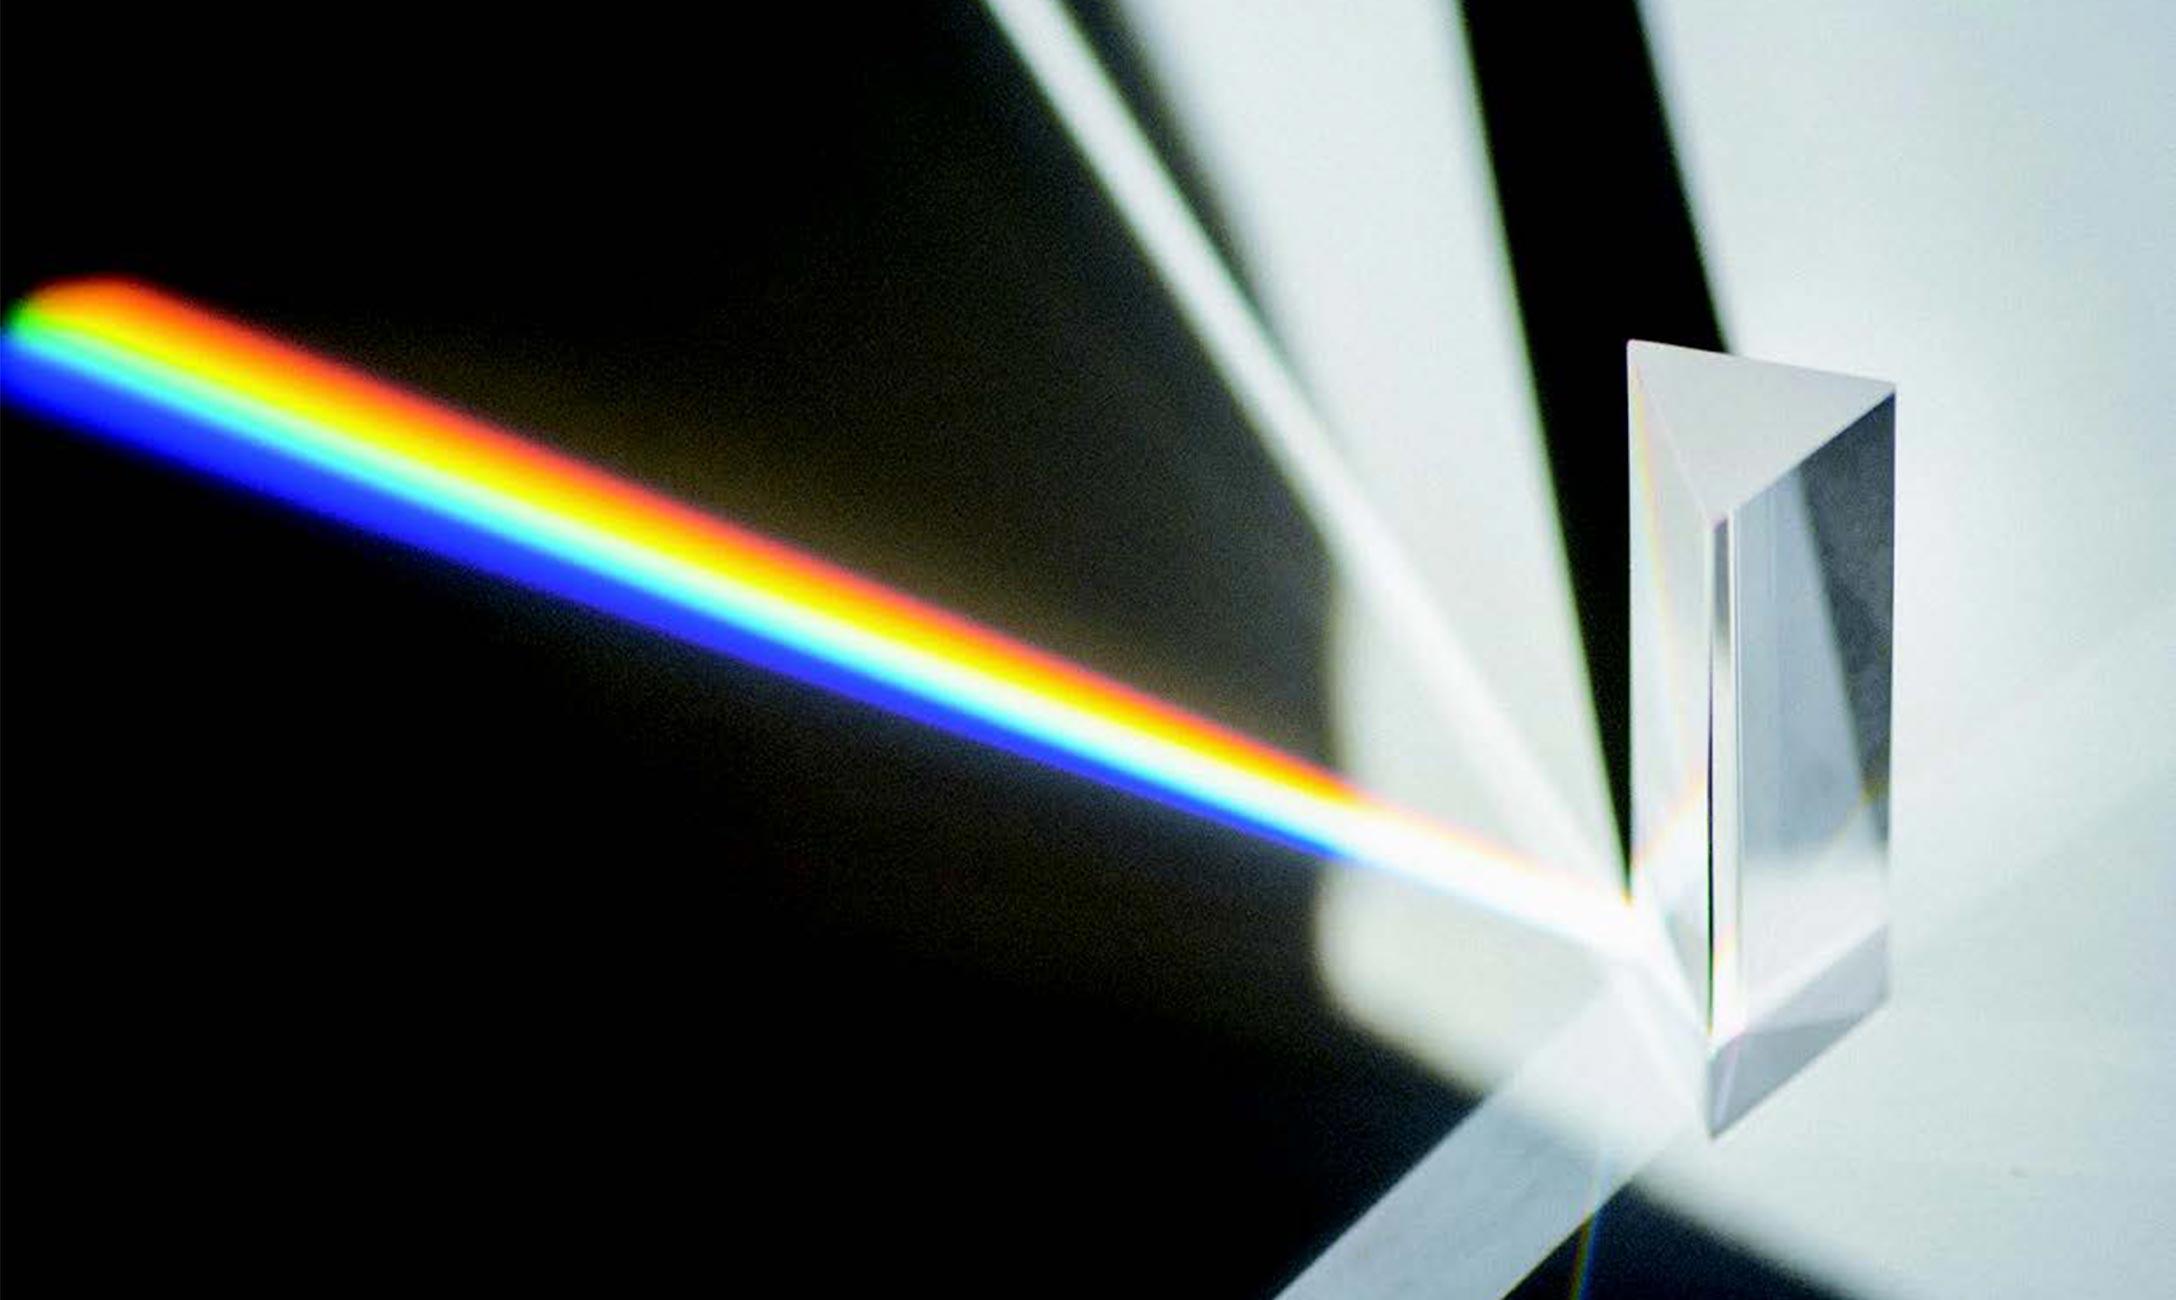 Prism splitting light into spectrum